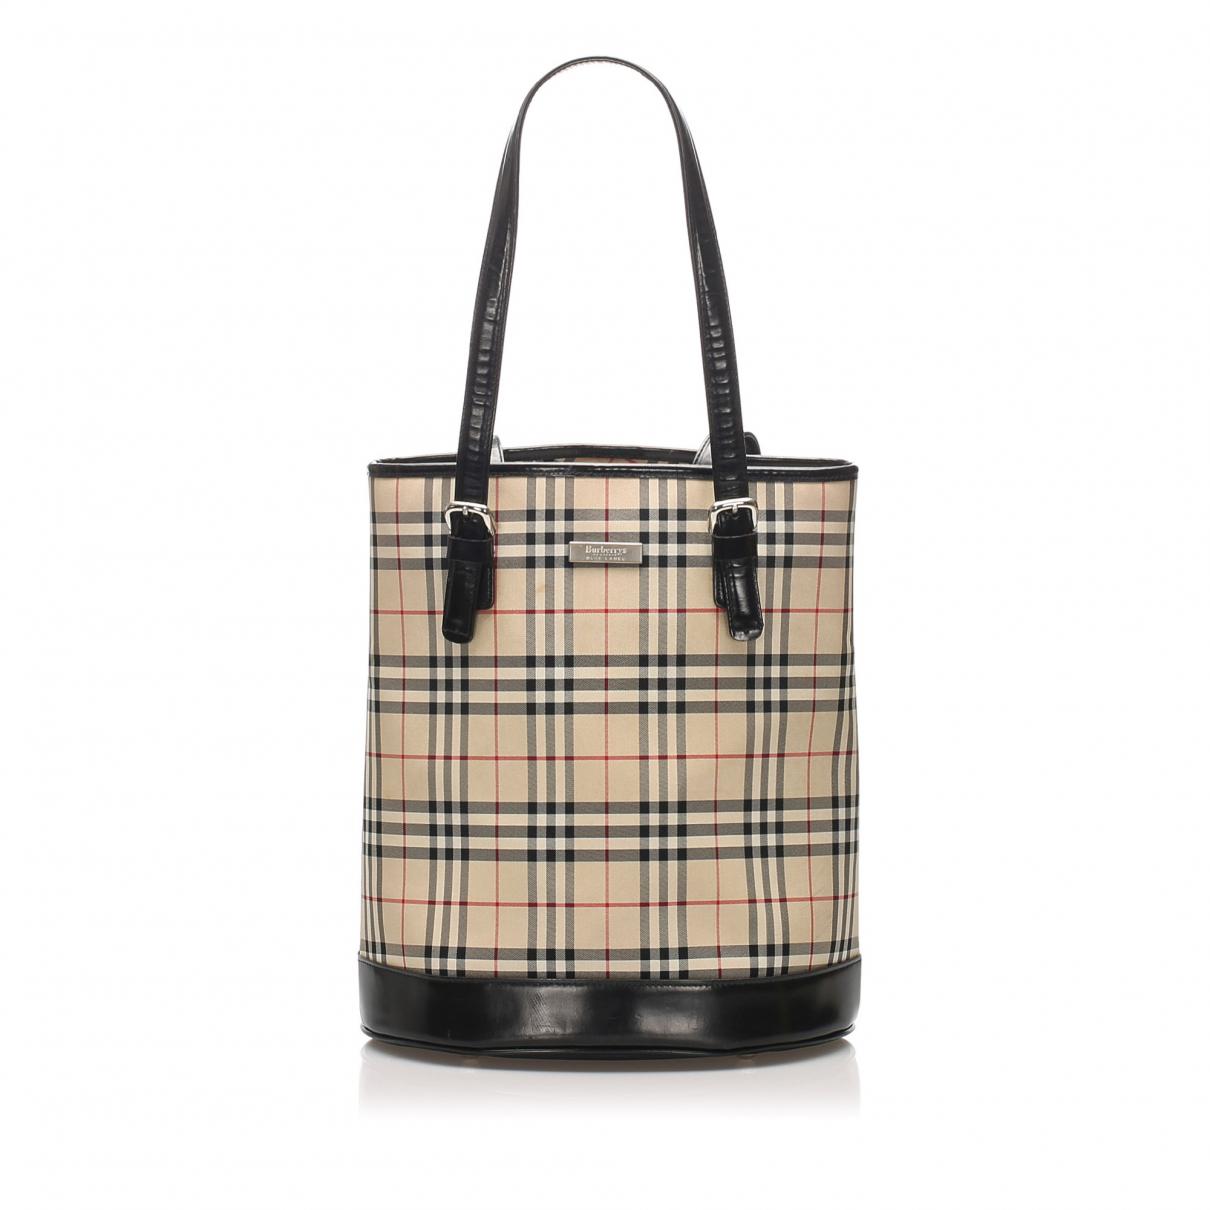 Burberry N Brown Cloth handbag for Women N